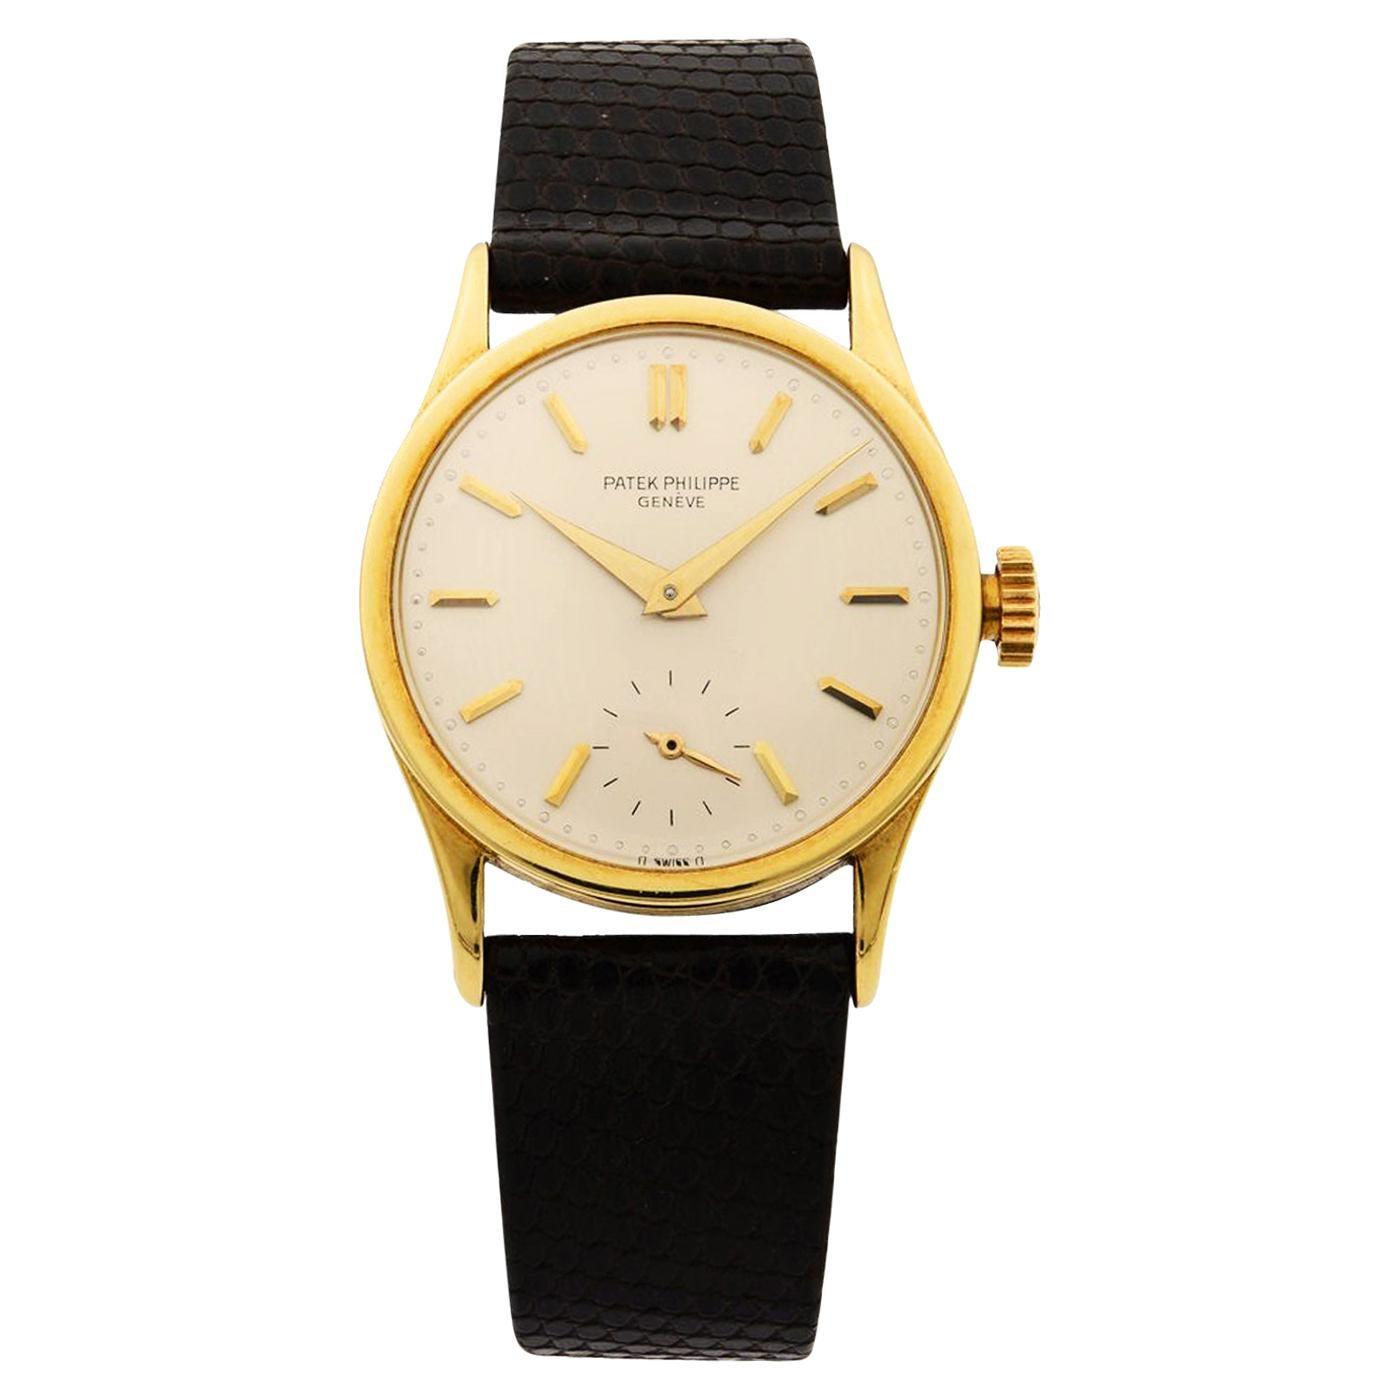 Patek Philippe Calatrava 18K Yellow Gold Manual Wind Men's Vintage Watch 3796J